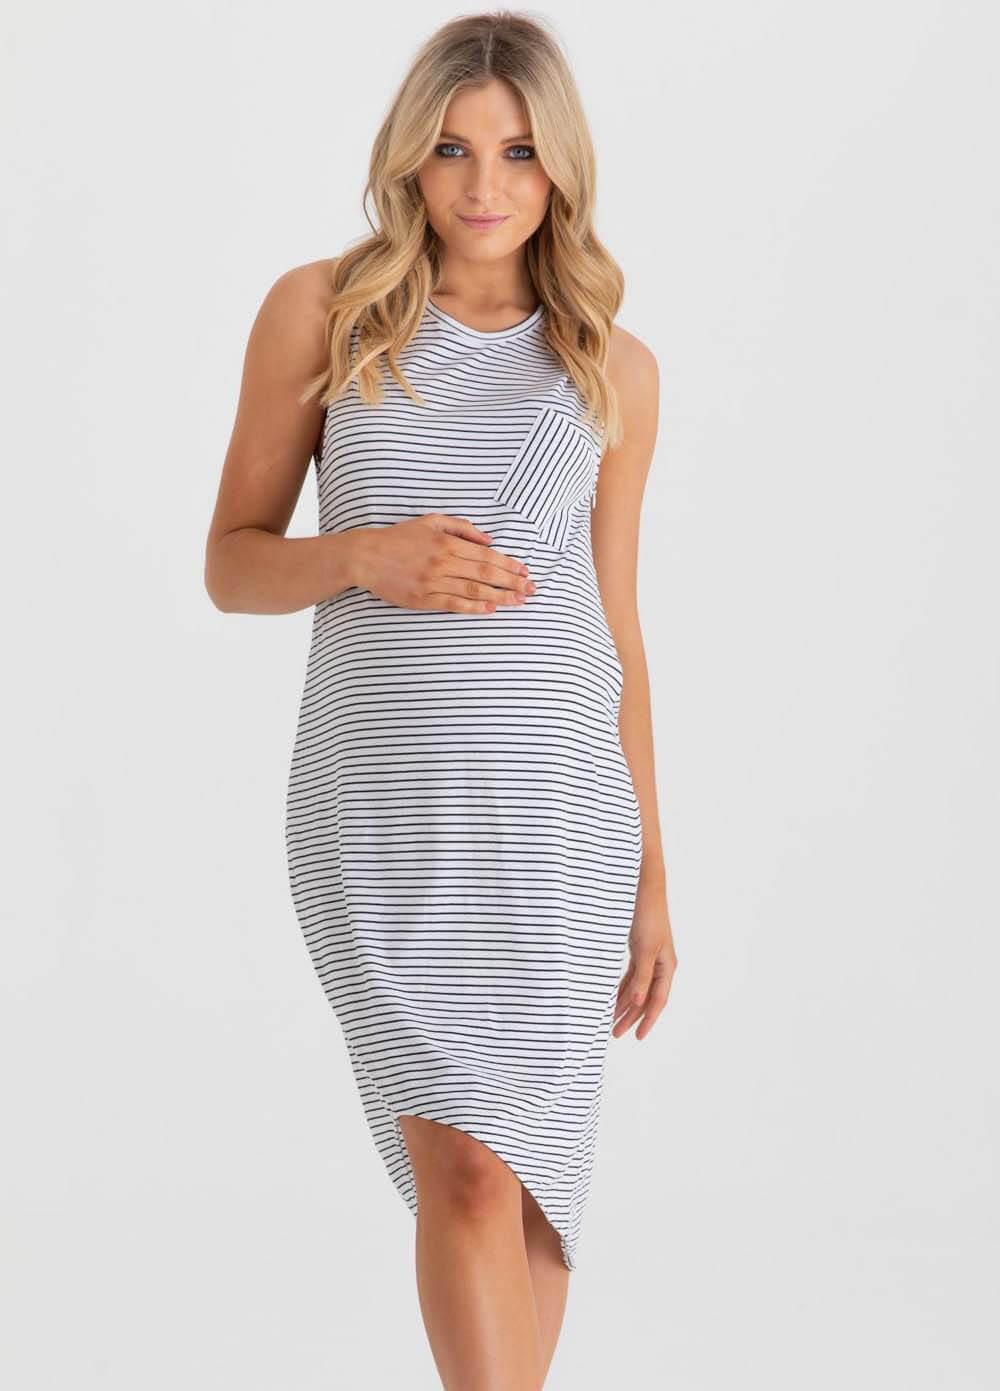 db98f54404 College Maternity Nursing Dress in White Black Stripes by Legoe